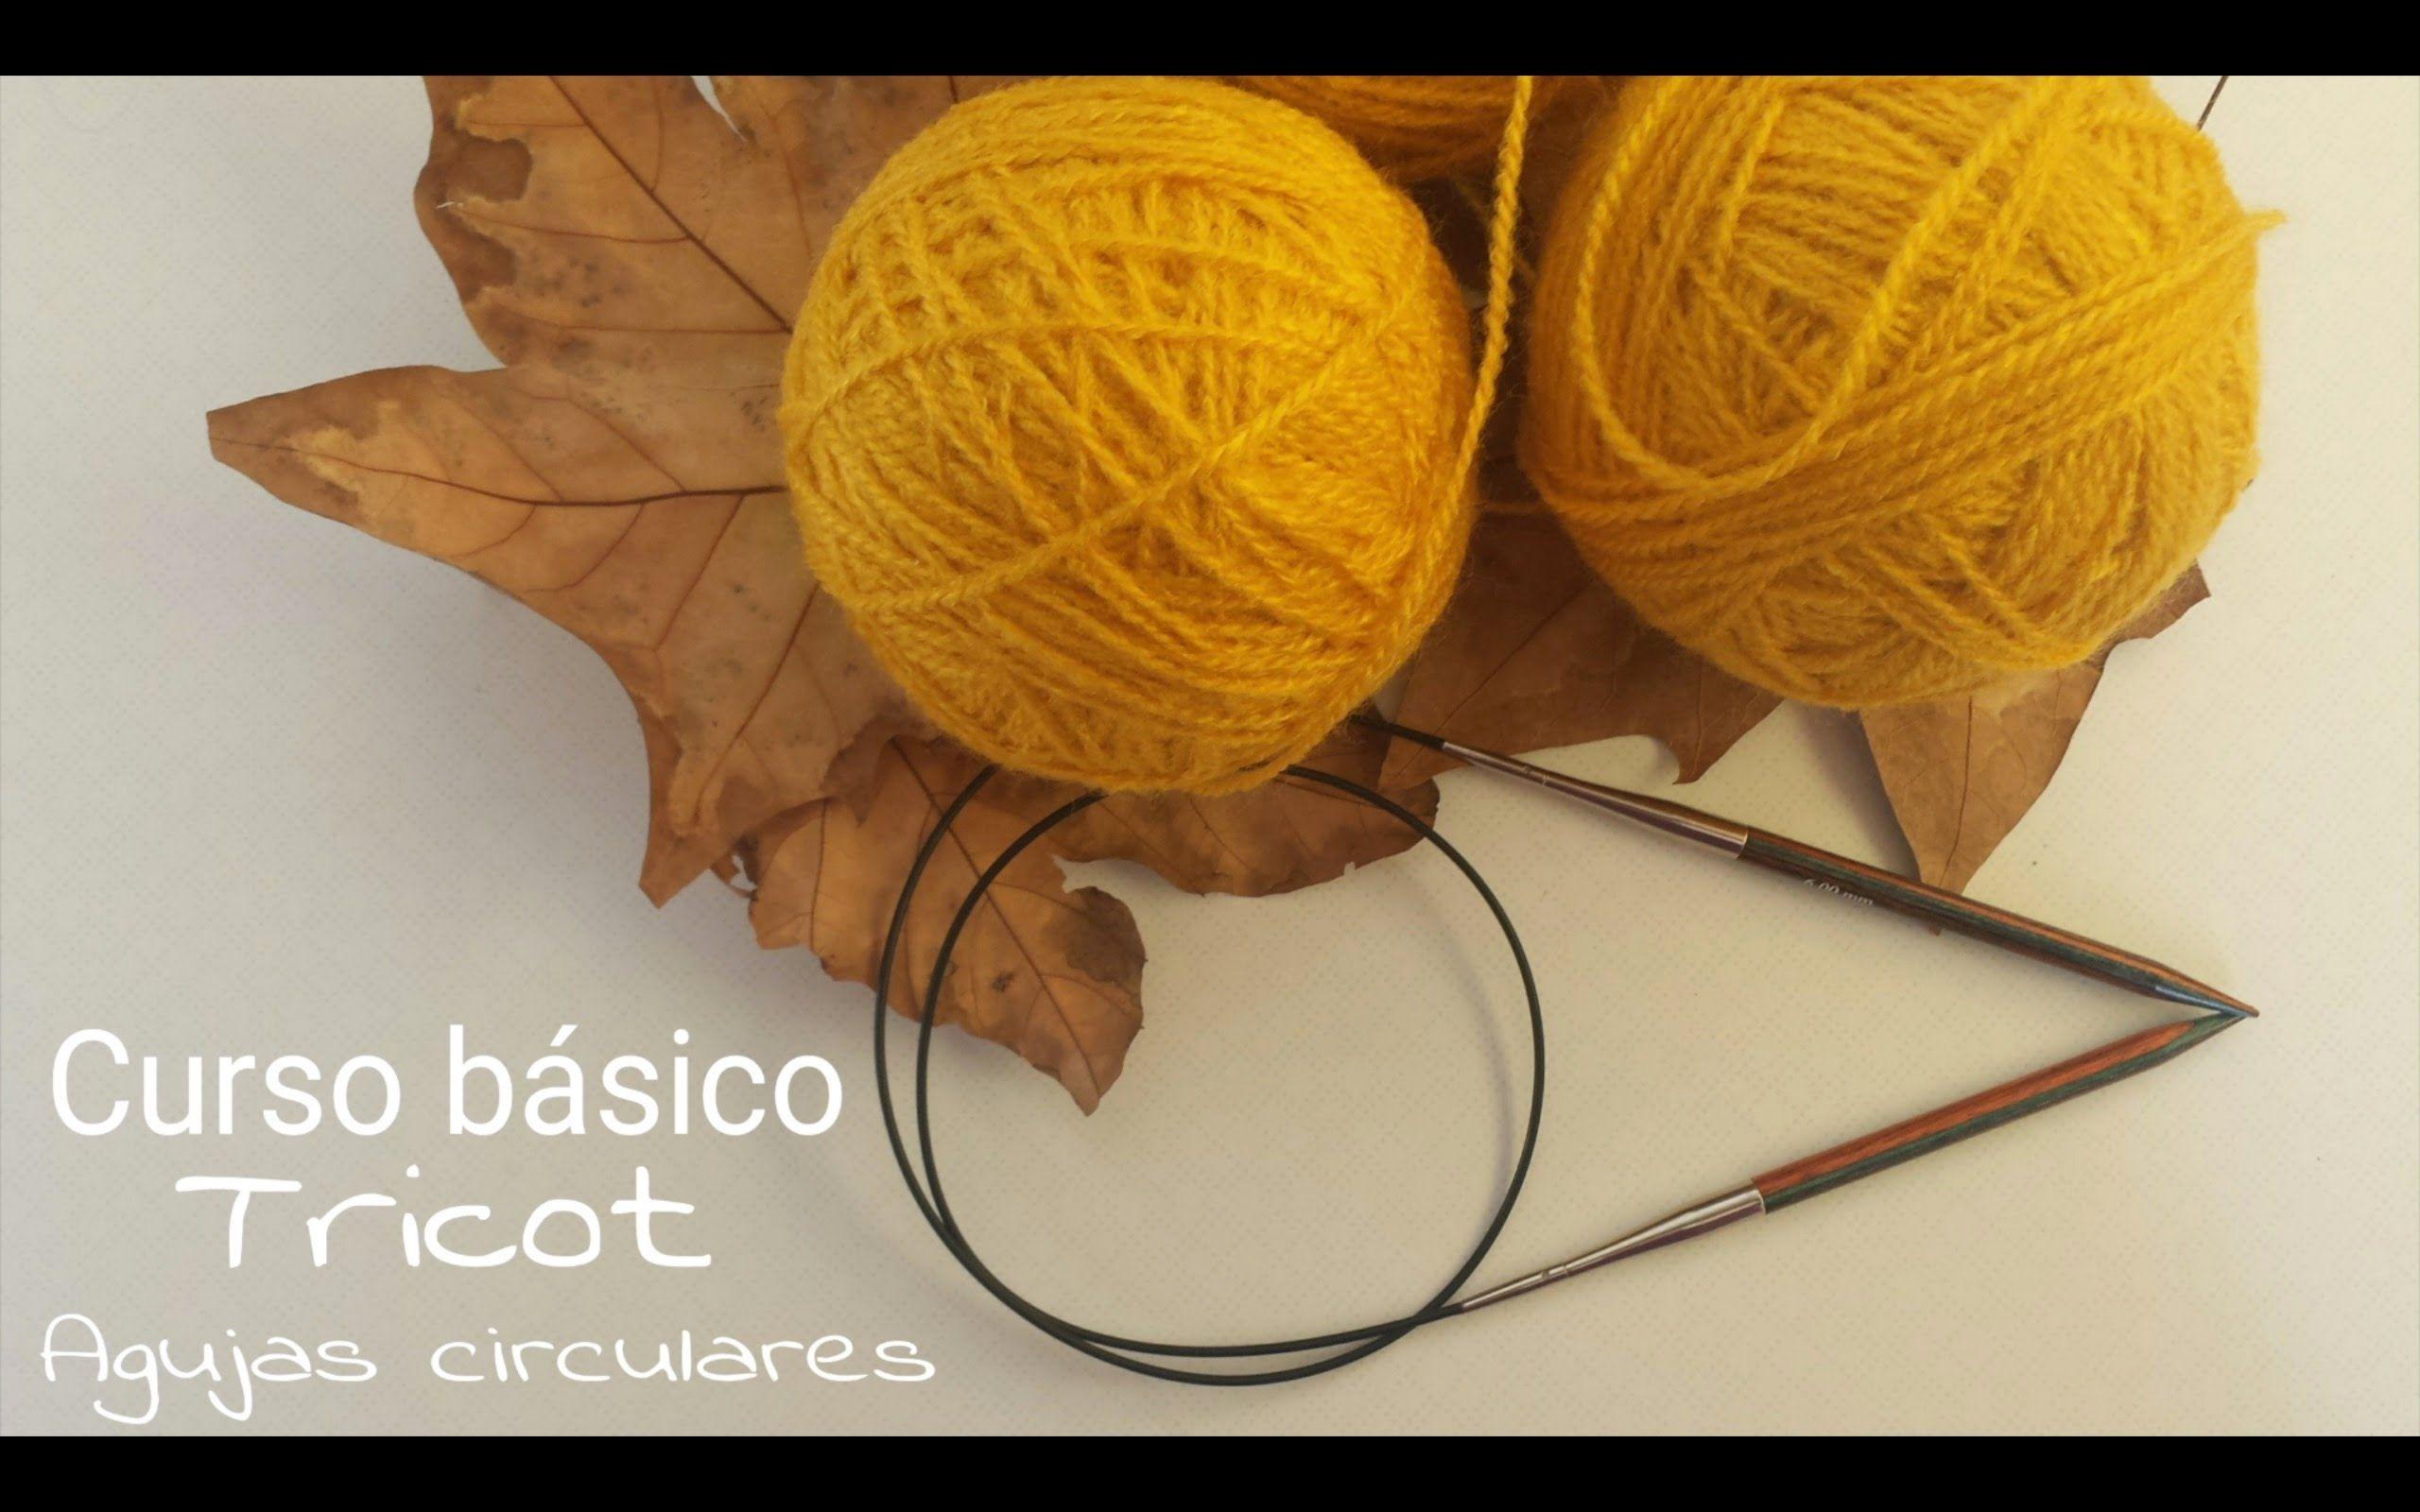 Técnica básica I Agujas circulares - Tricot I cucaditasdesaluta ...